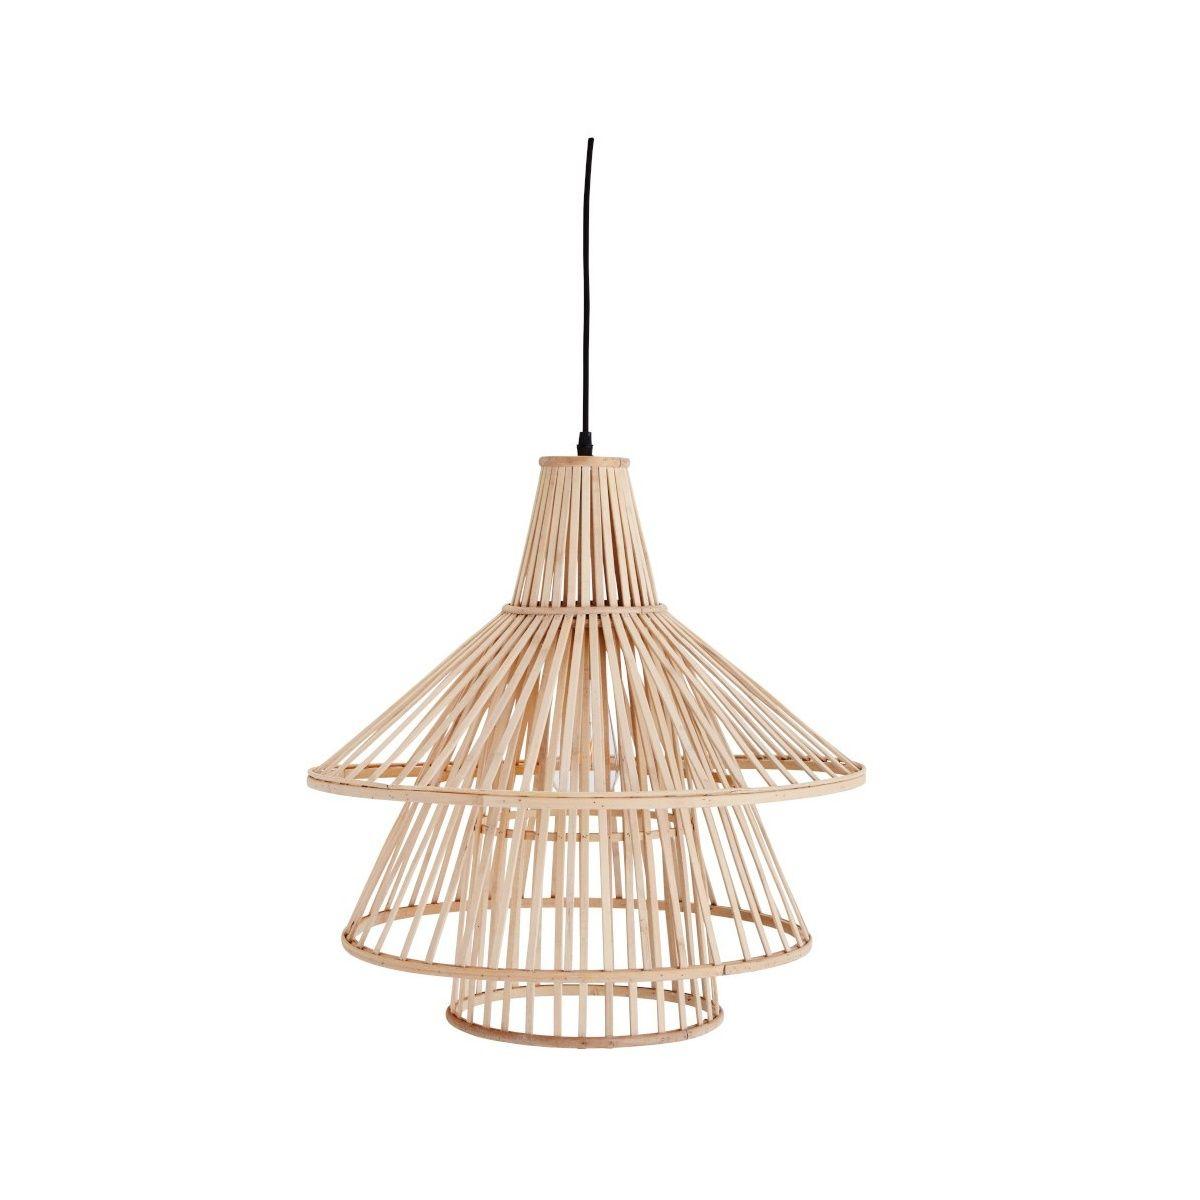 Madam Stoltz Bamboo Lamp natural in 2020 | Bamboo lamp, Lamp